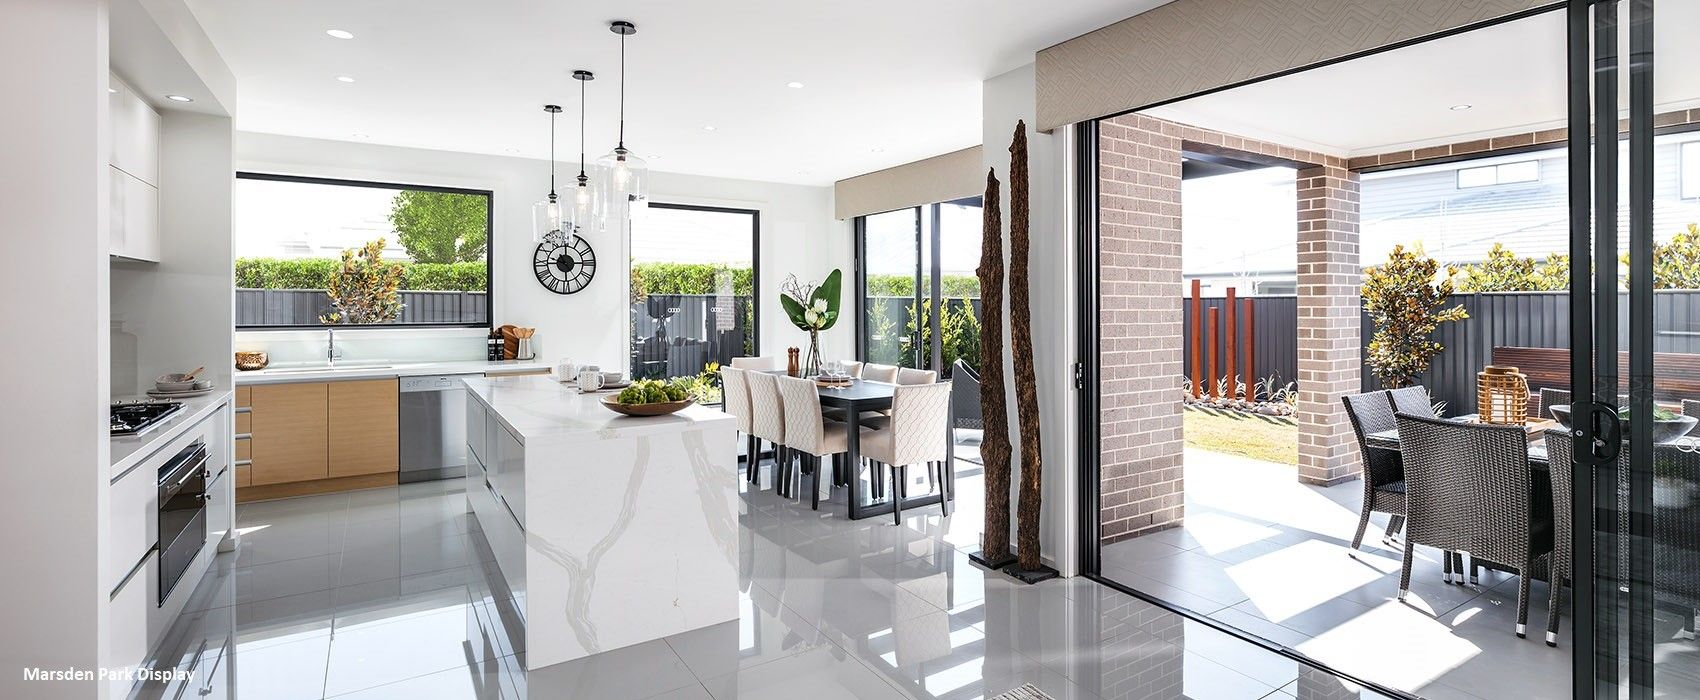 Best Synergy Home Design House Design Home House Plans 400 x 300